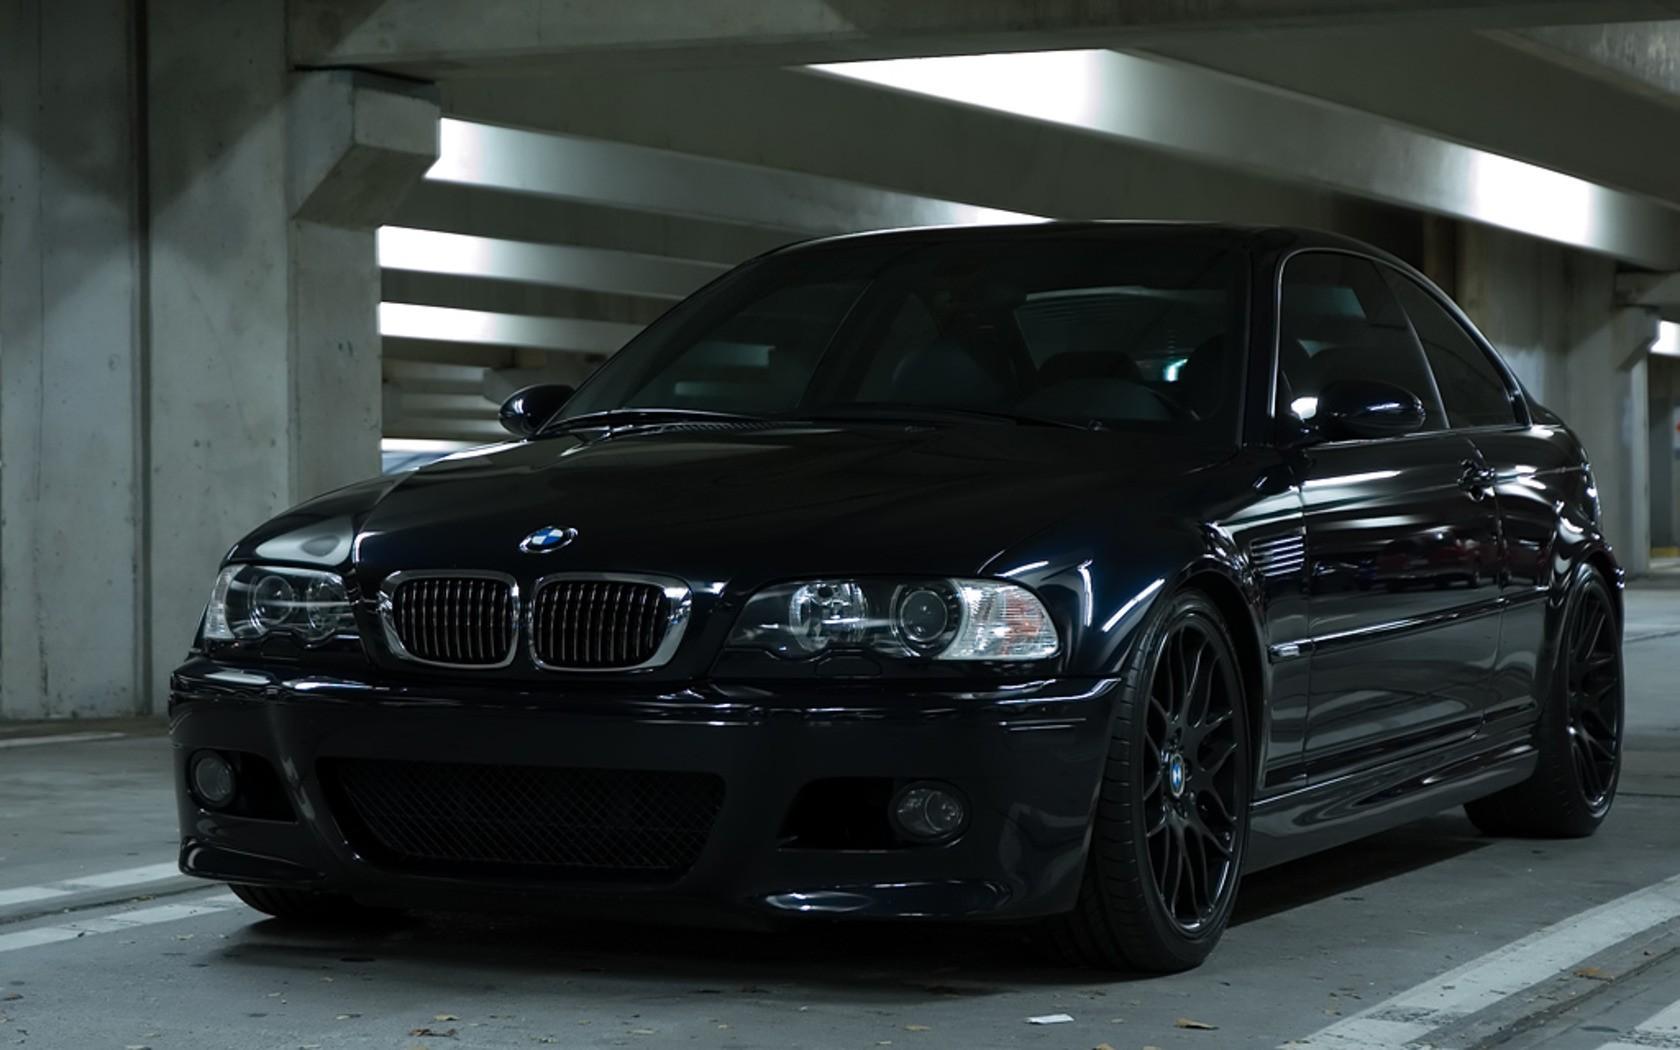 Wallpaper Black Cars Sports Car Bmw M3 Coupe